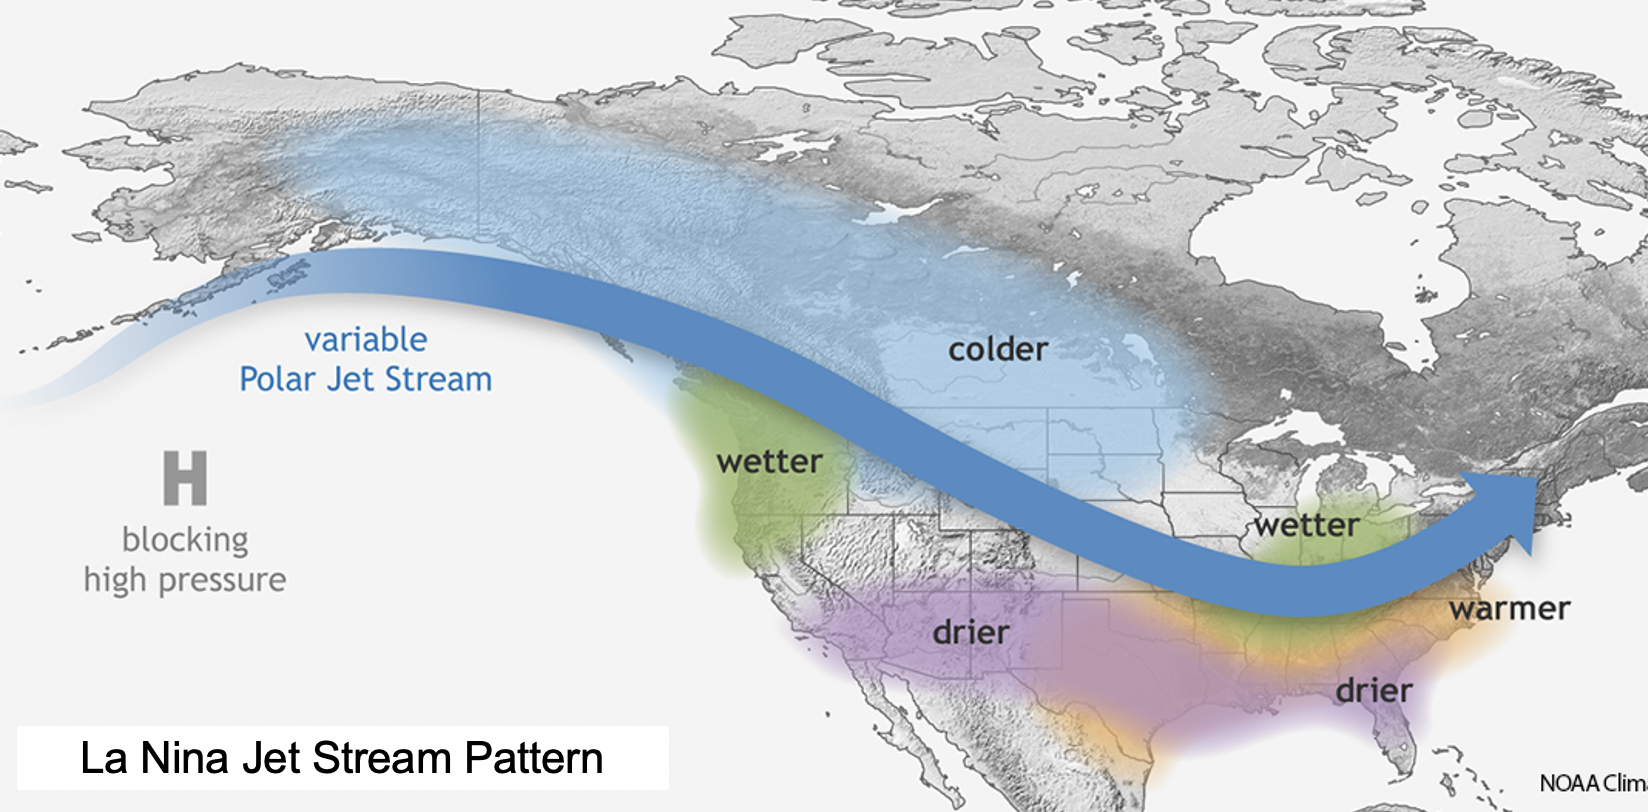 Map showing a la nina winter